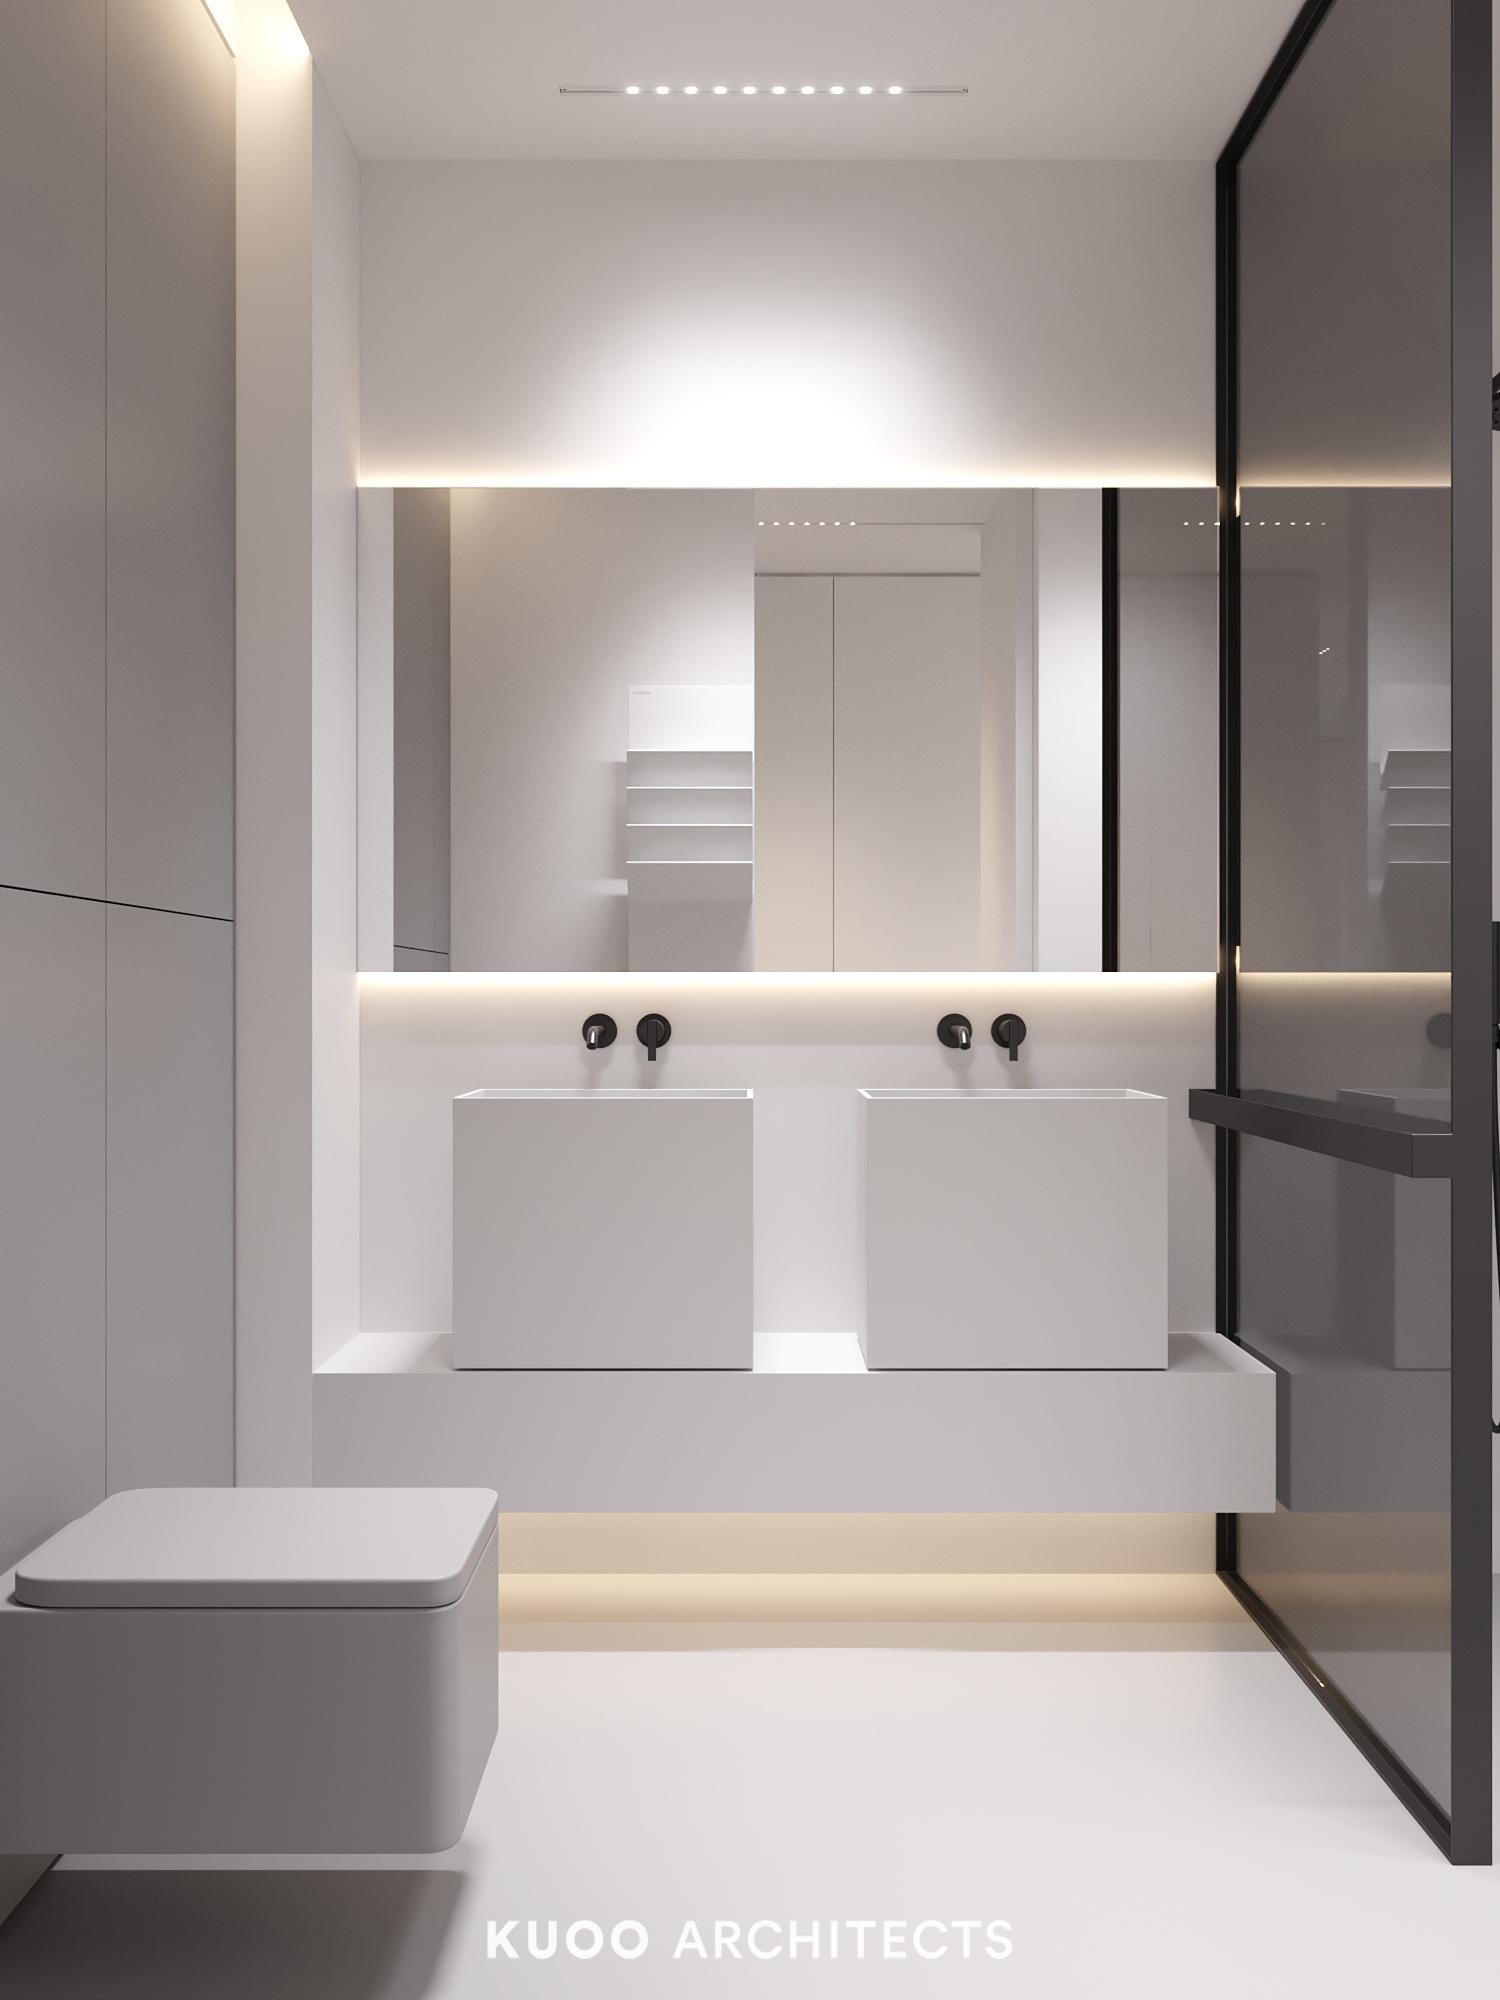 kuoo_architects_ap_warsaw_8_10